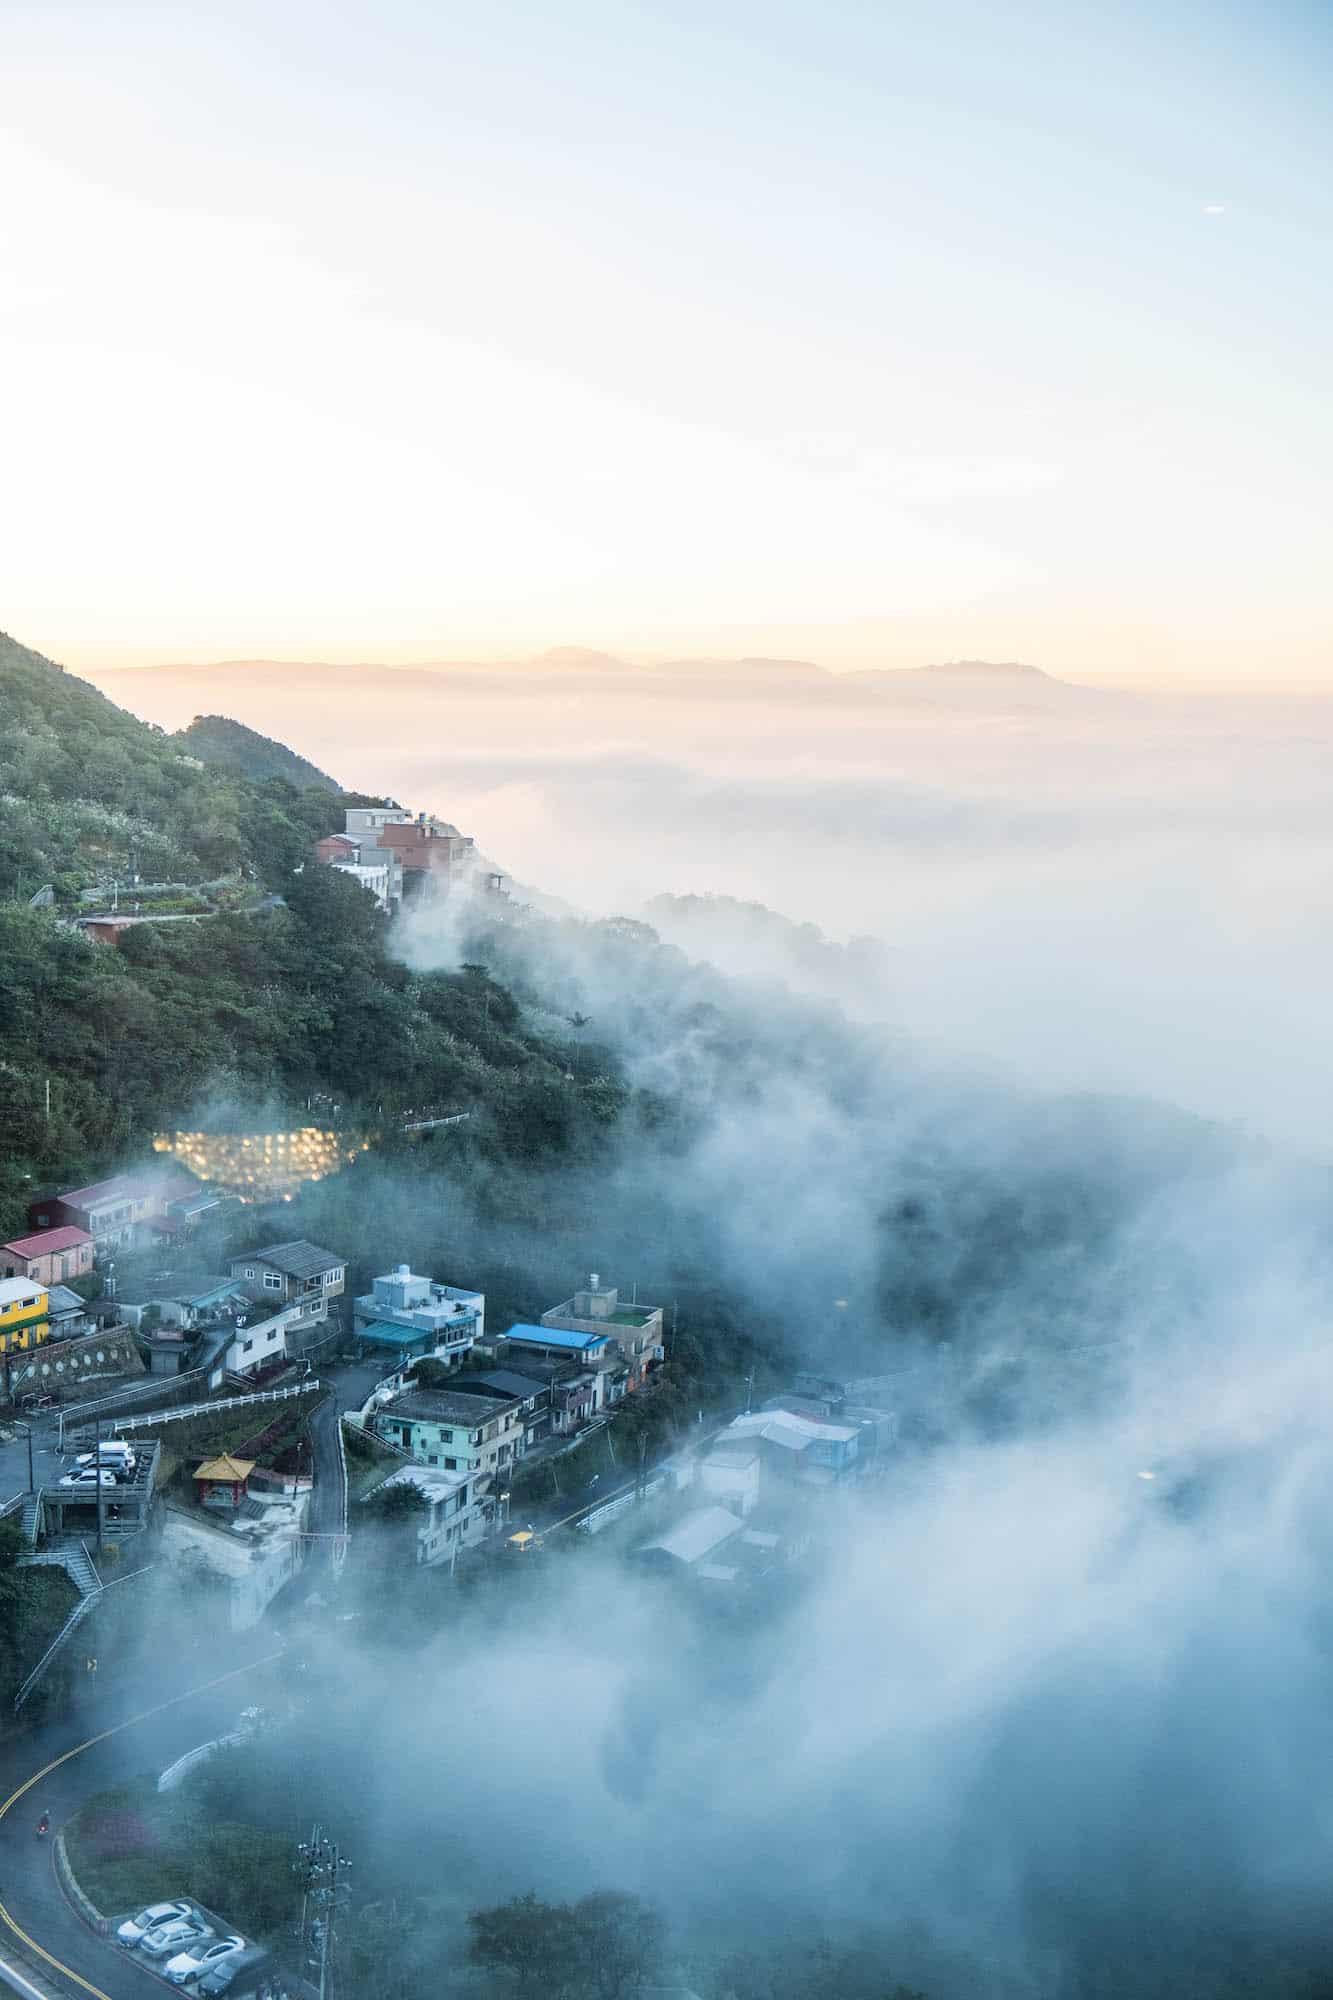 Taiwan Travel - Cloudy Landscape